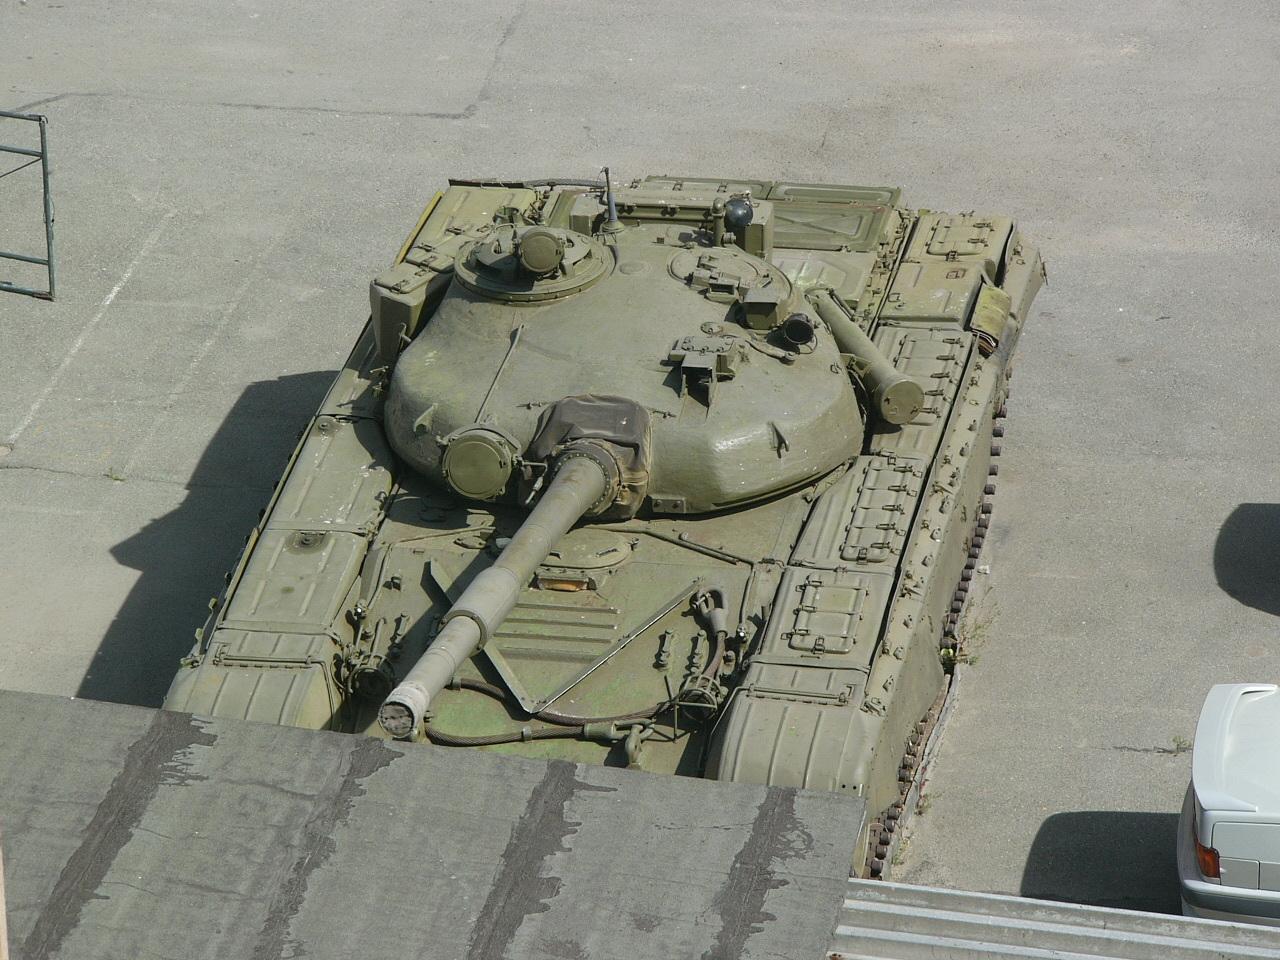 t-72.26446sfsfr.jpg